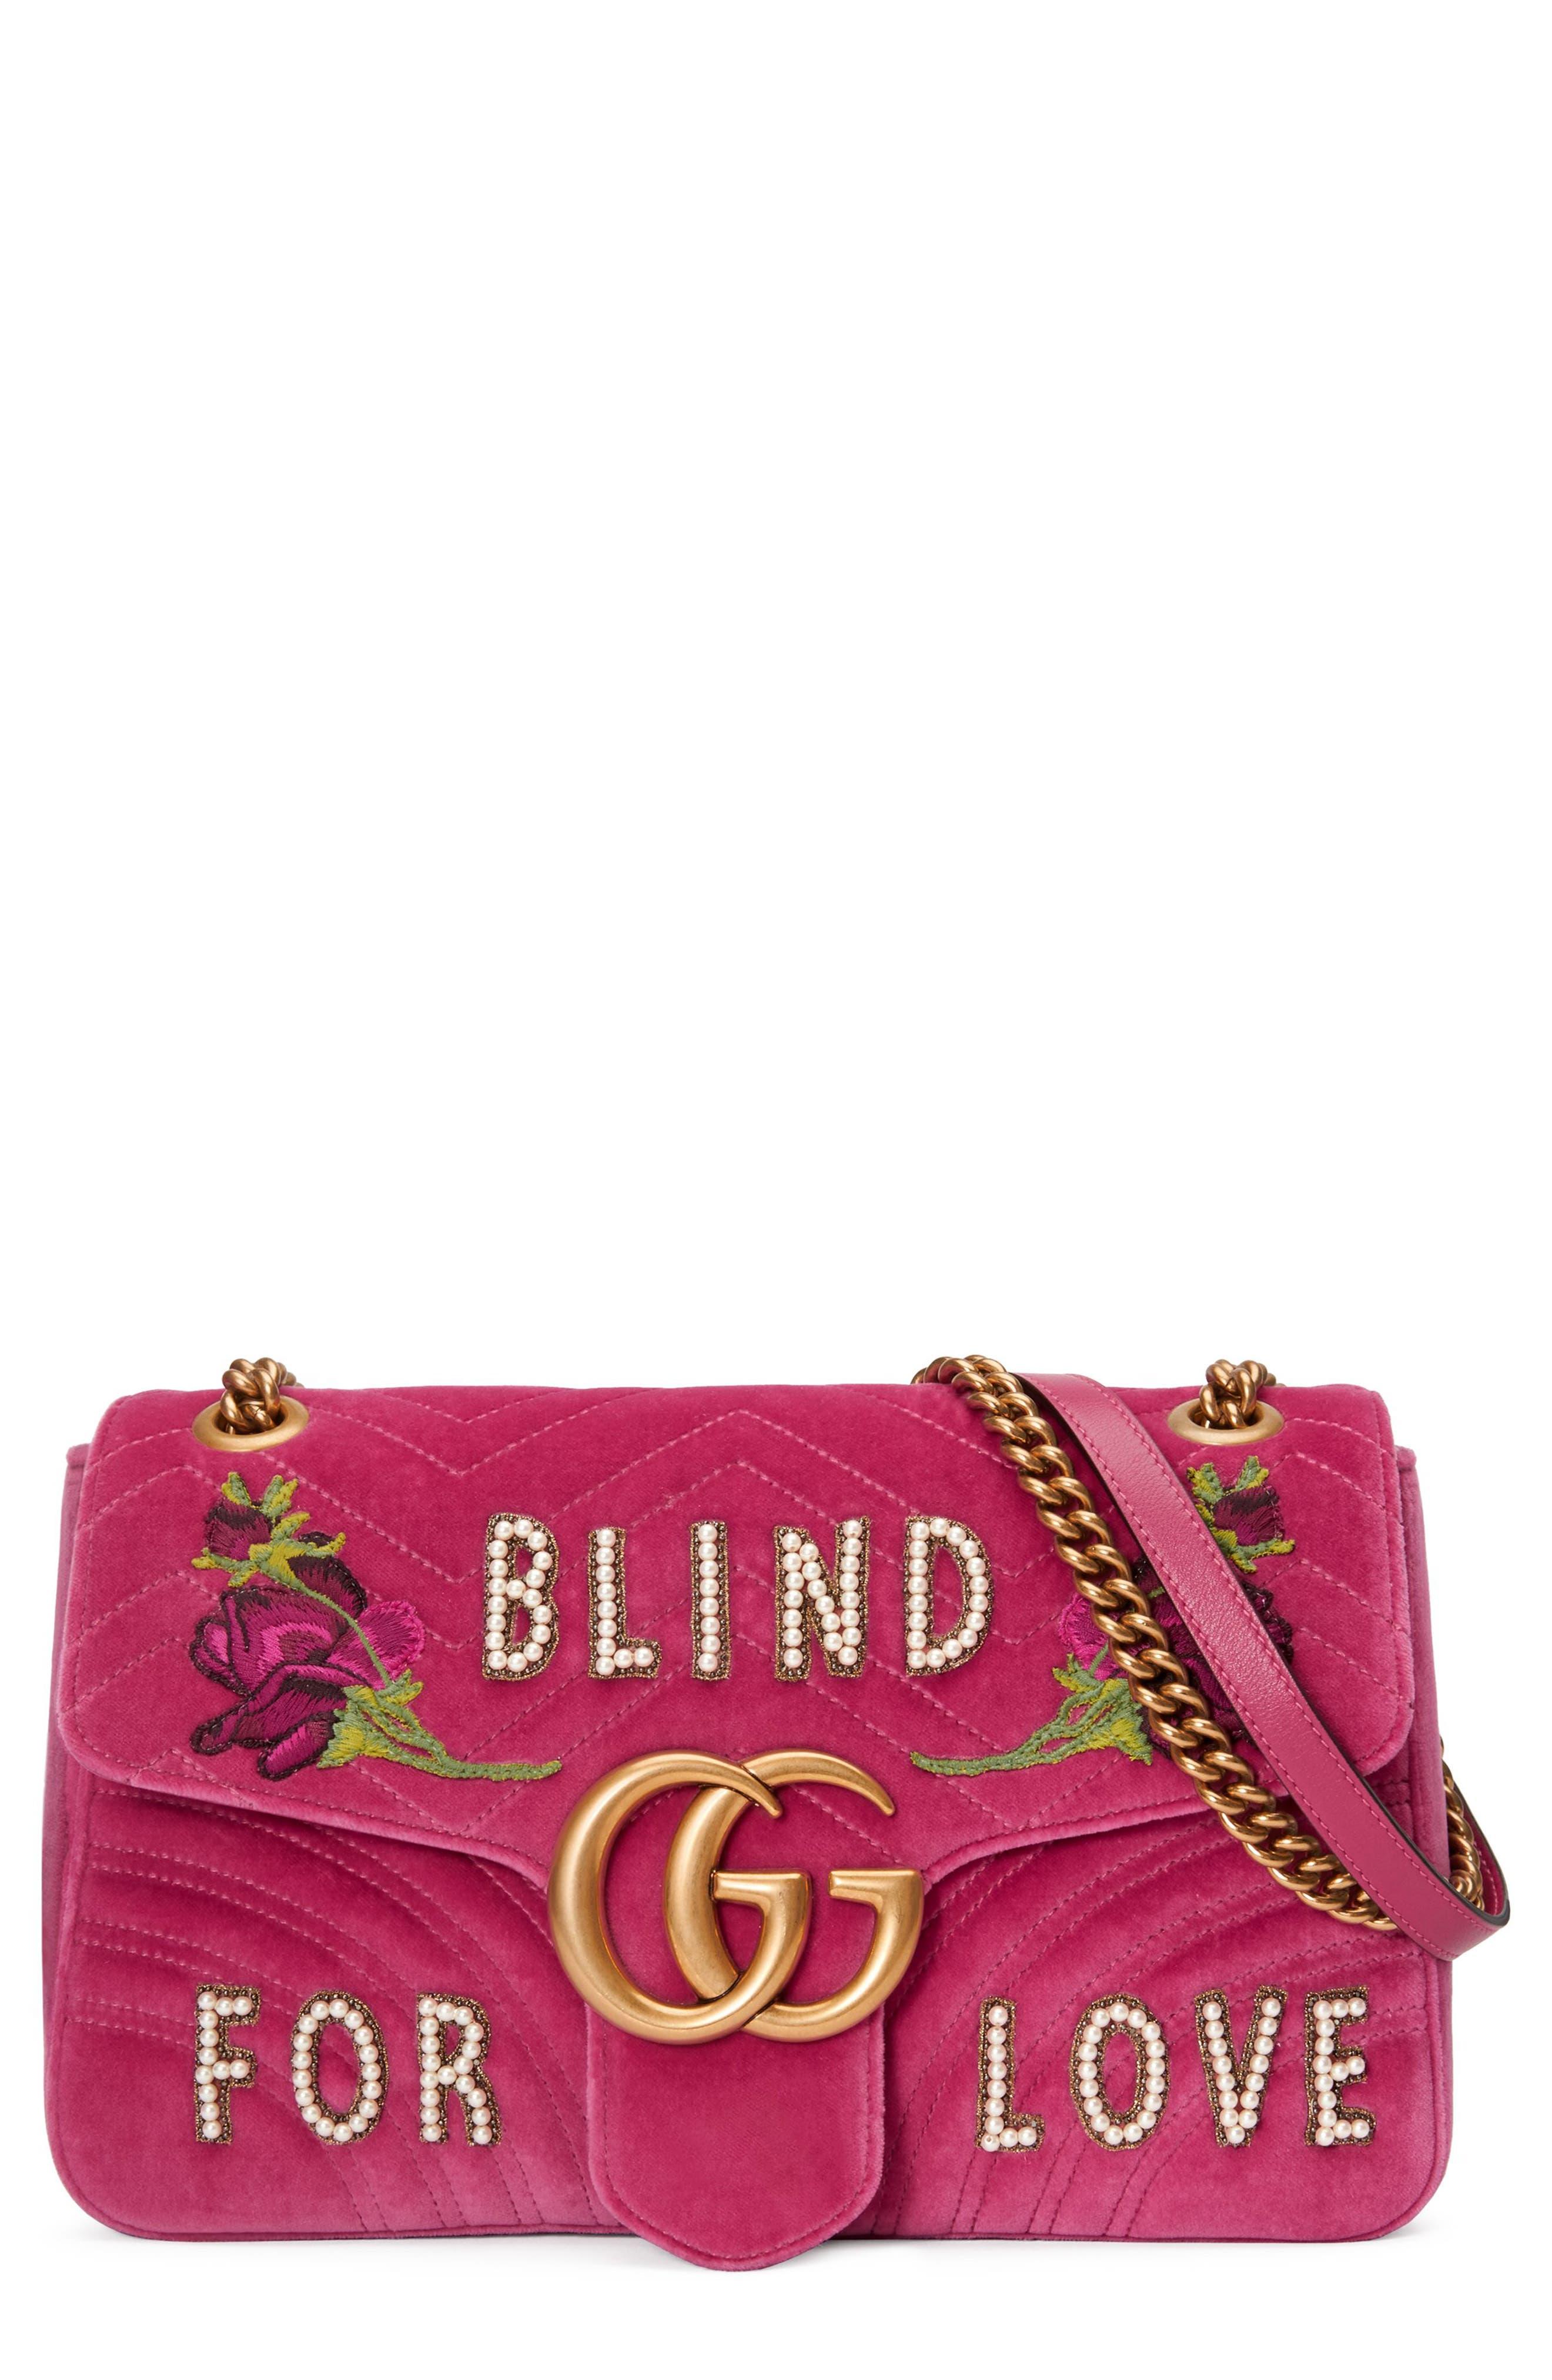 Alternate Image 1 Selected - Gucci GG Marmont 2.0 Imitation Pearl Embellished Velvet Crossbody Bag